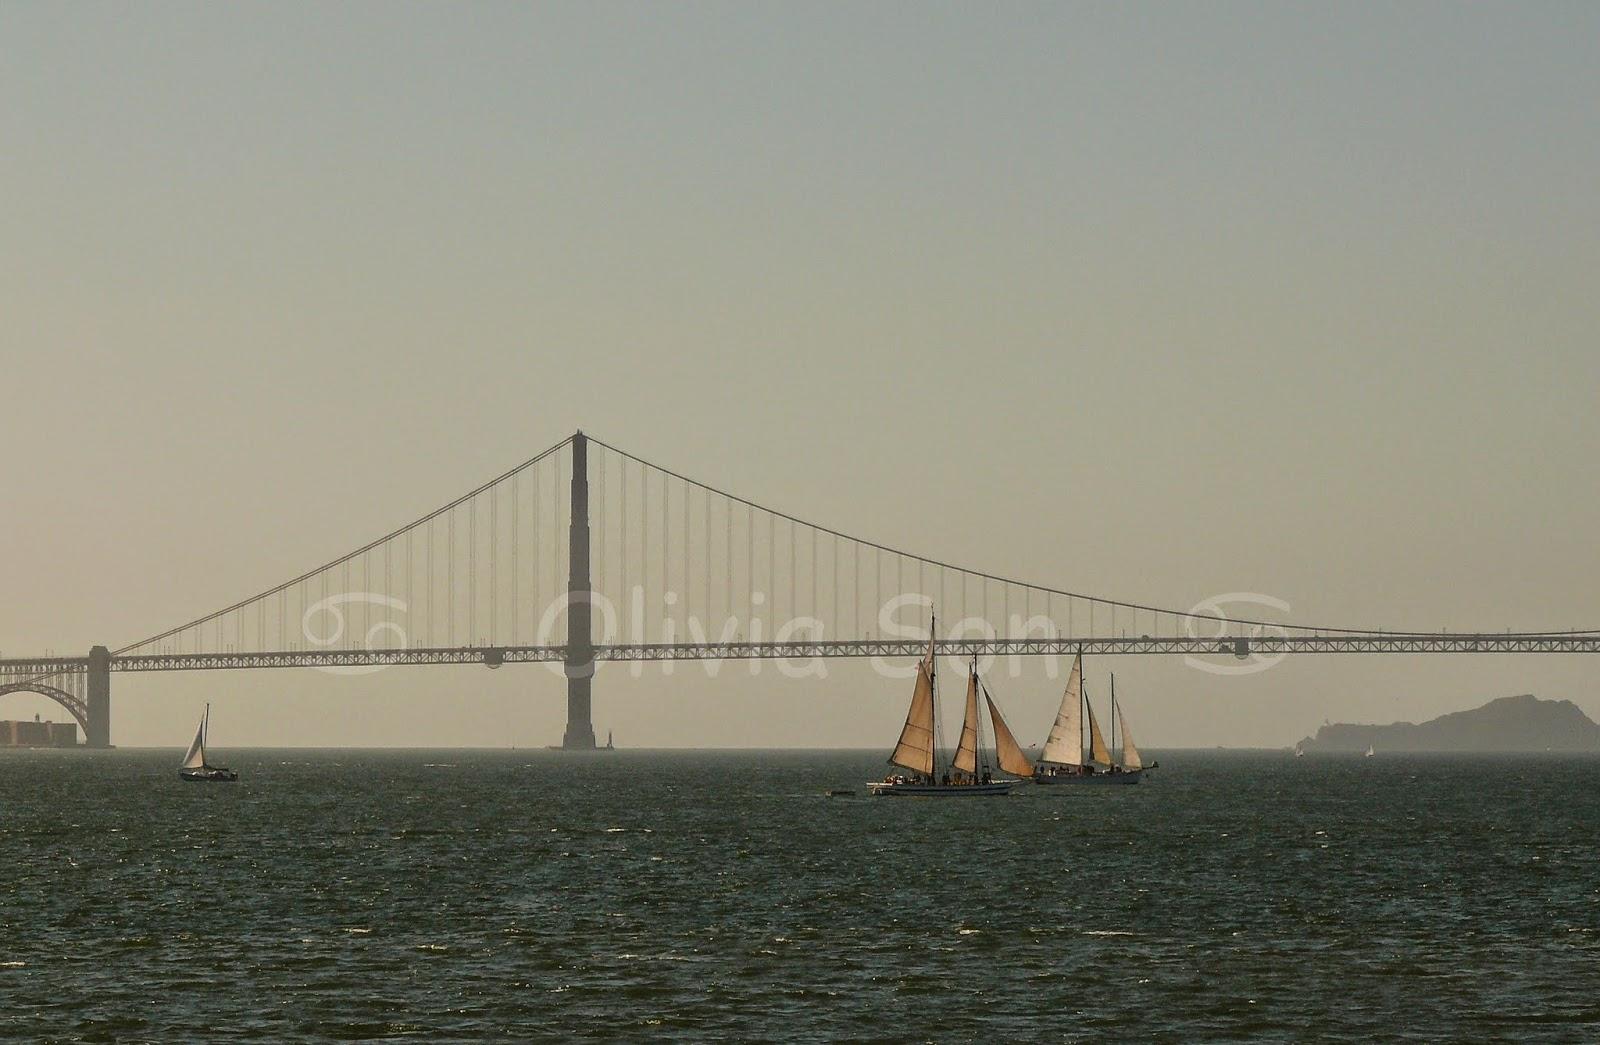 golden gate bridge san francisco, californie, usa